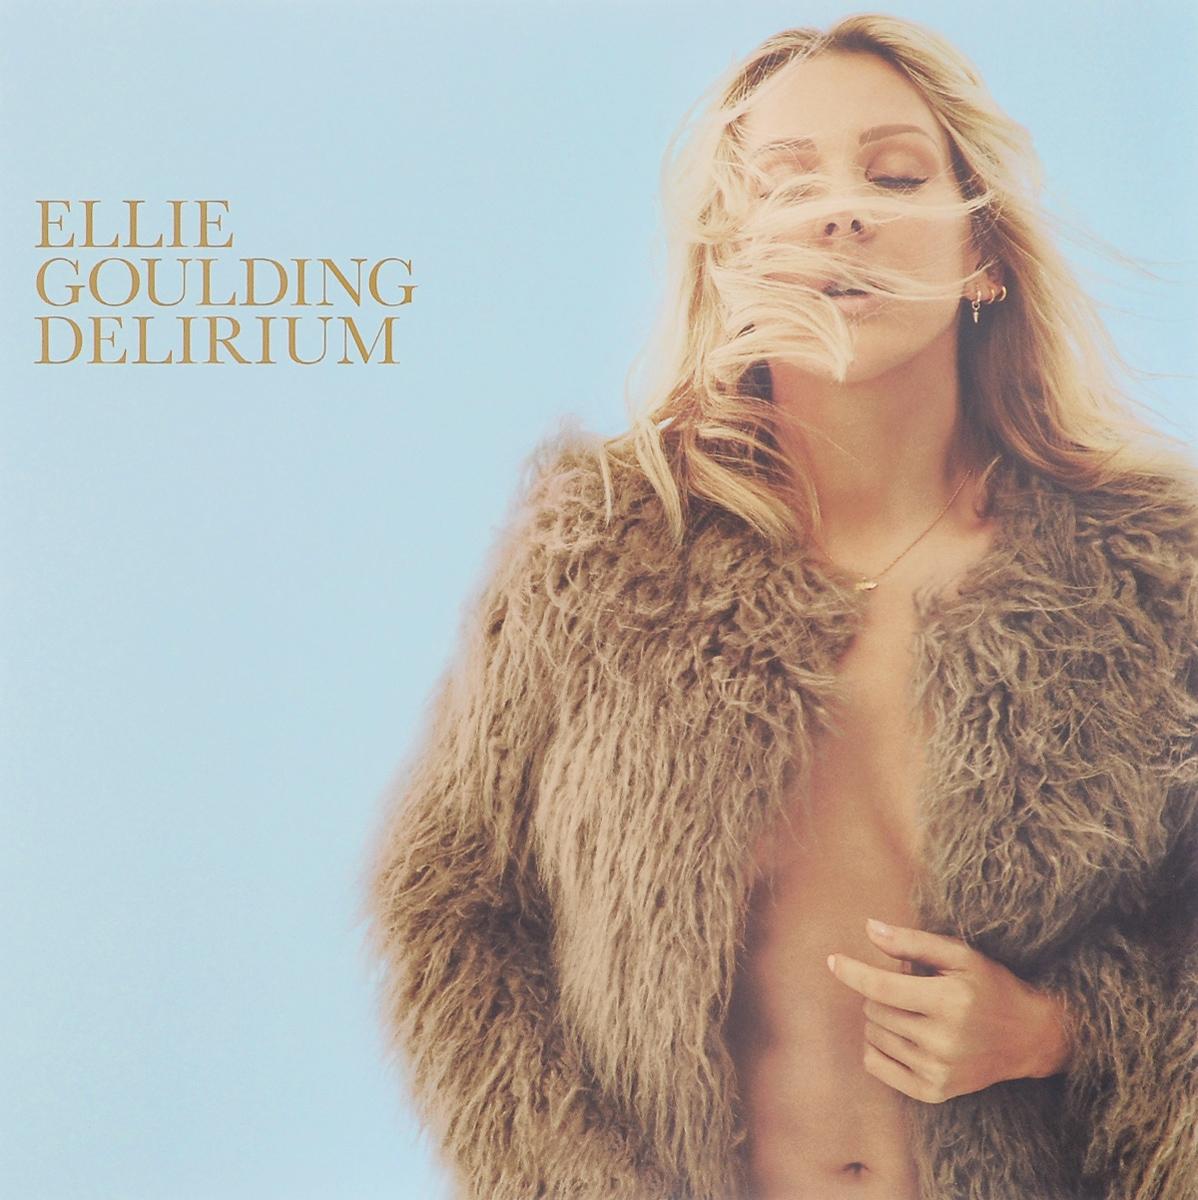 Элли Голдинг Ellie Goulding. Delirium (2 LP) элли голдинг ellie goulding delirium